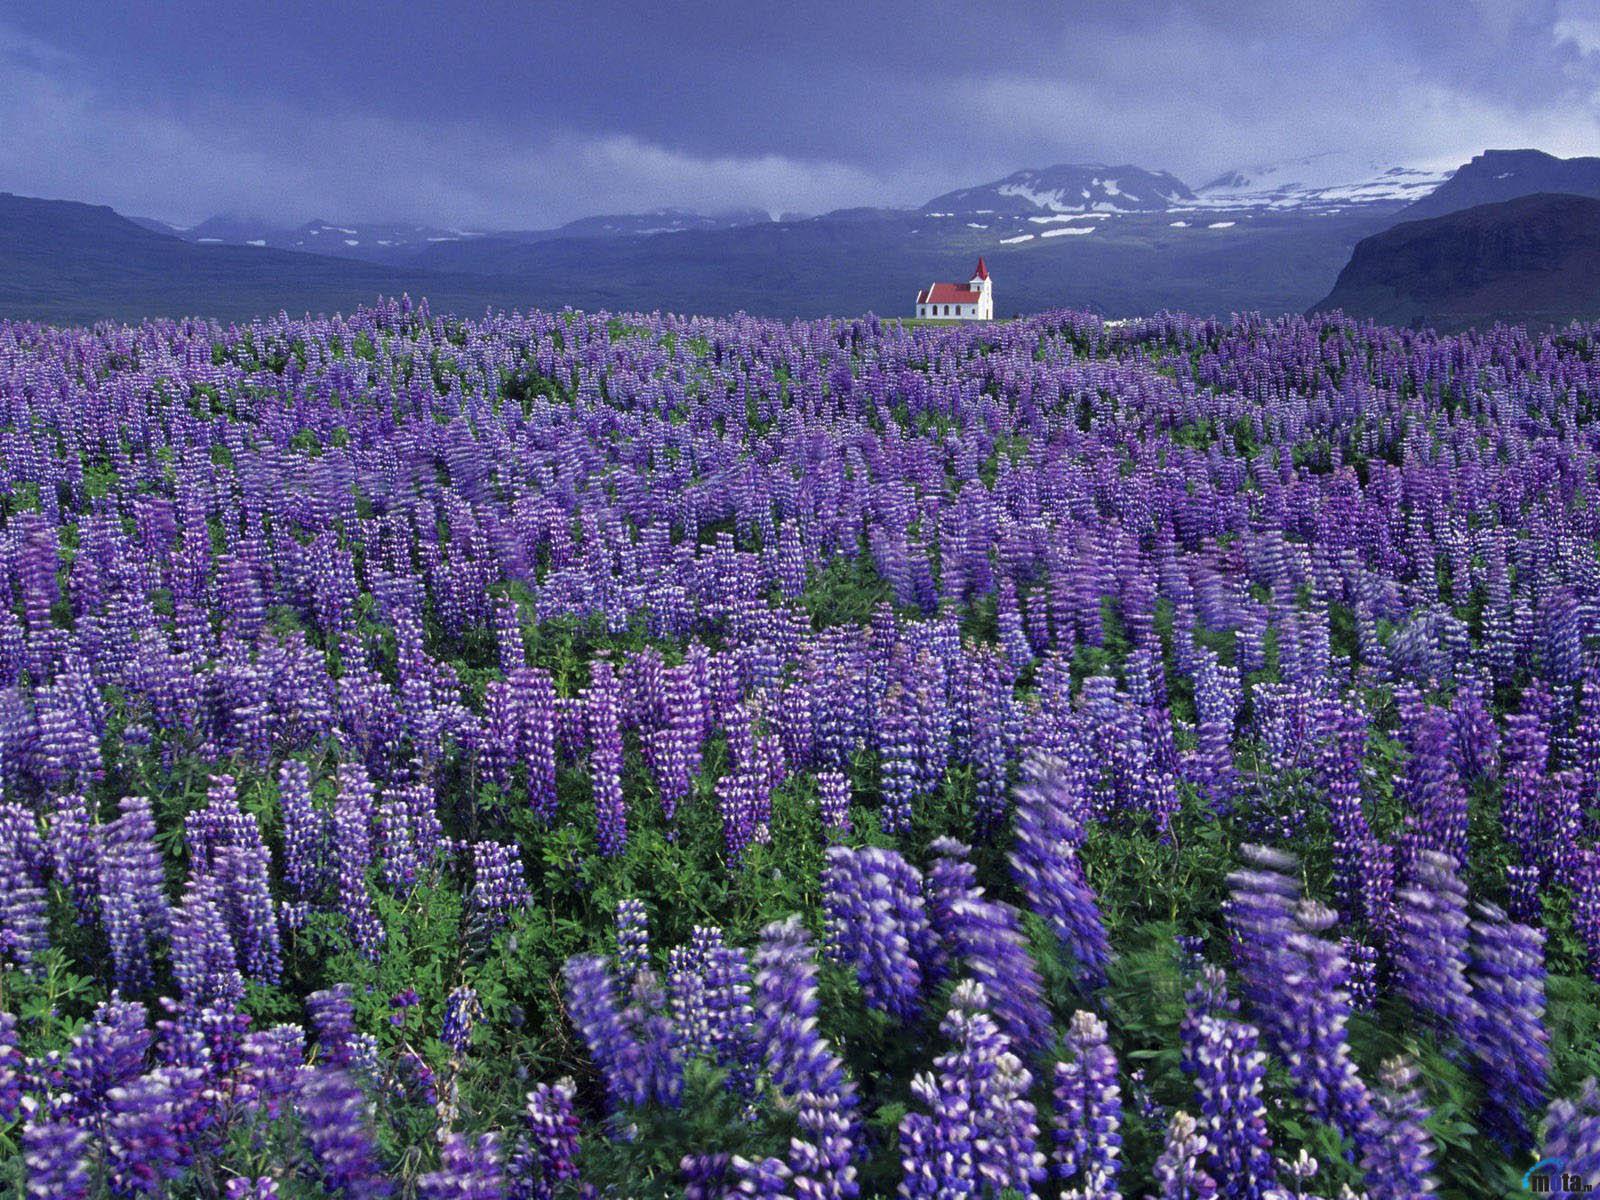 Download wallpaper Lavender Field 1600x1200